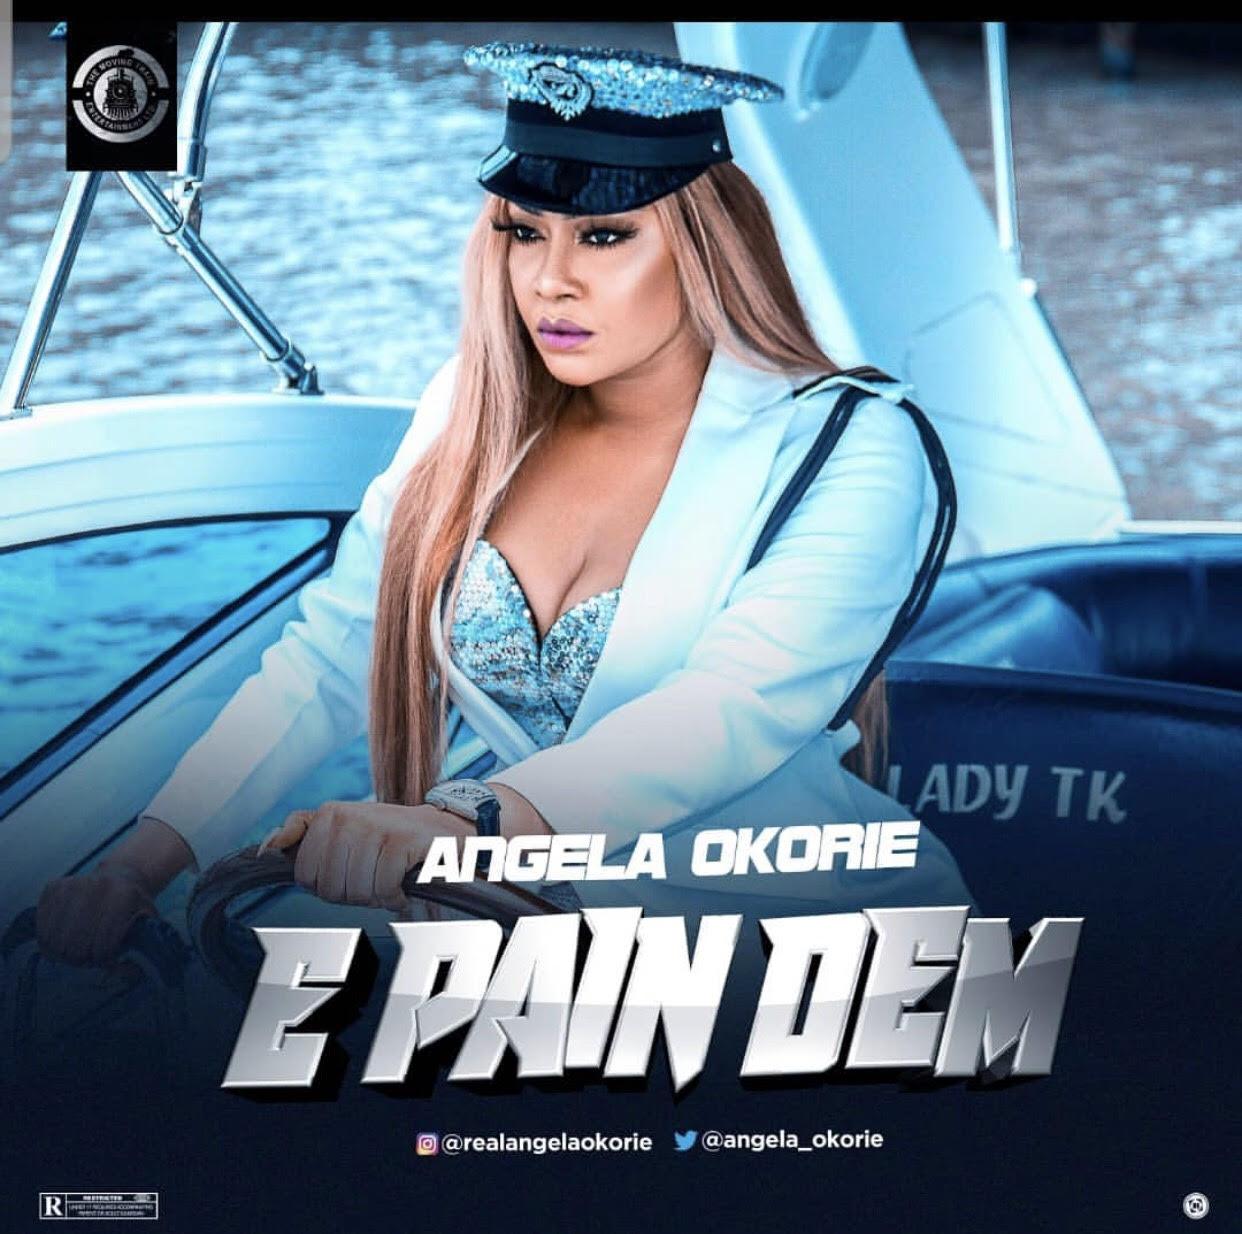 Angela Okorie - E Pain Dem - Download mp3